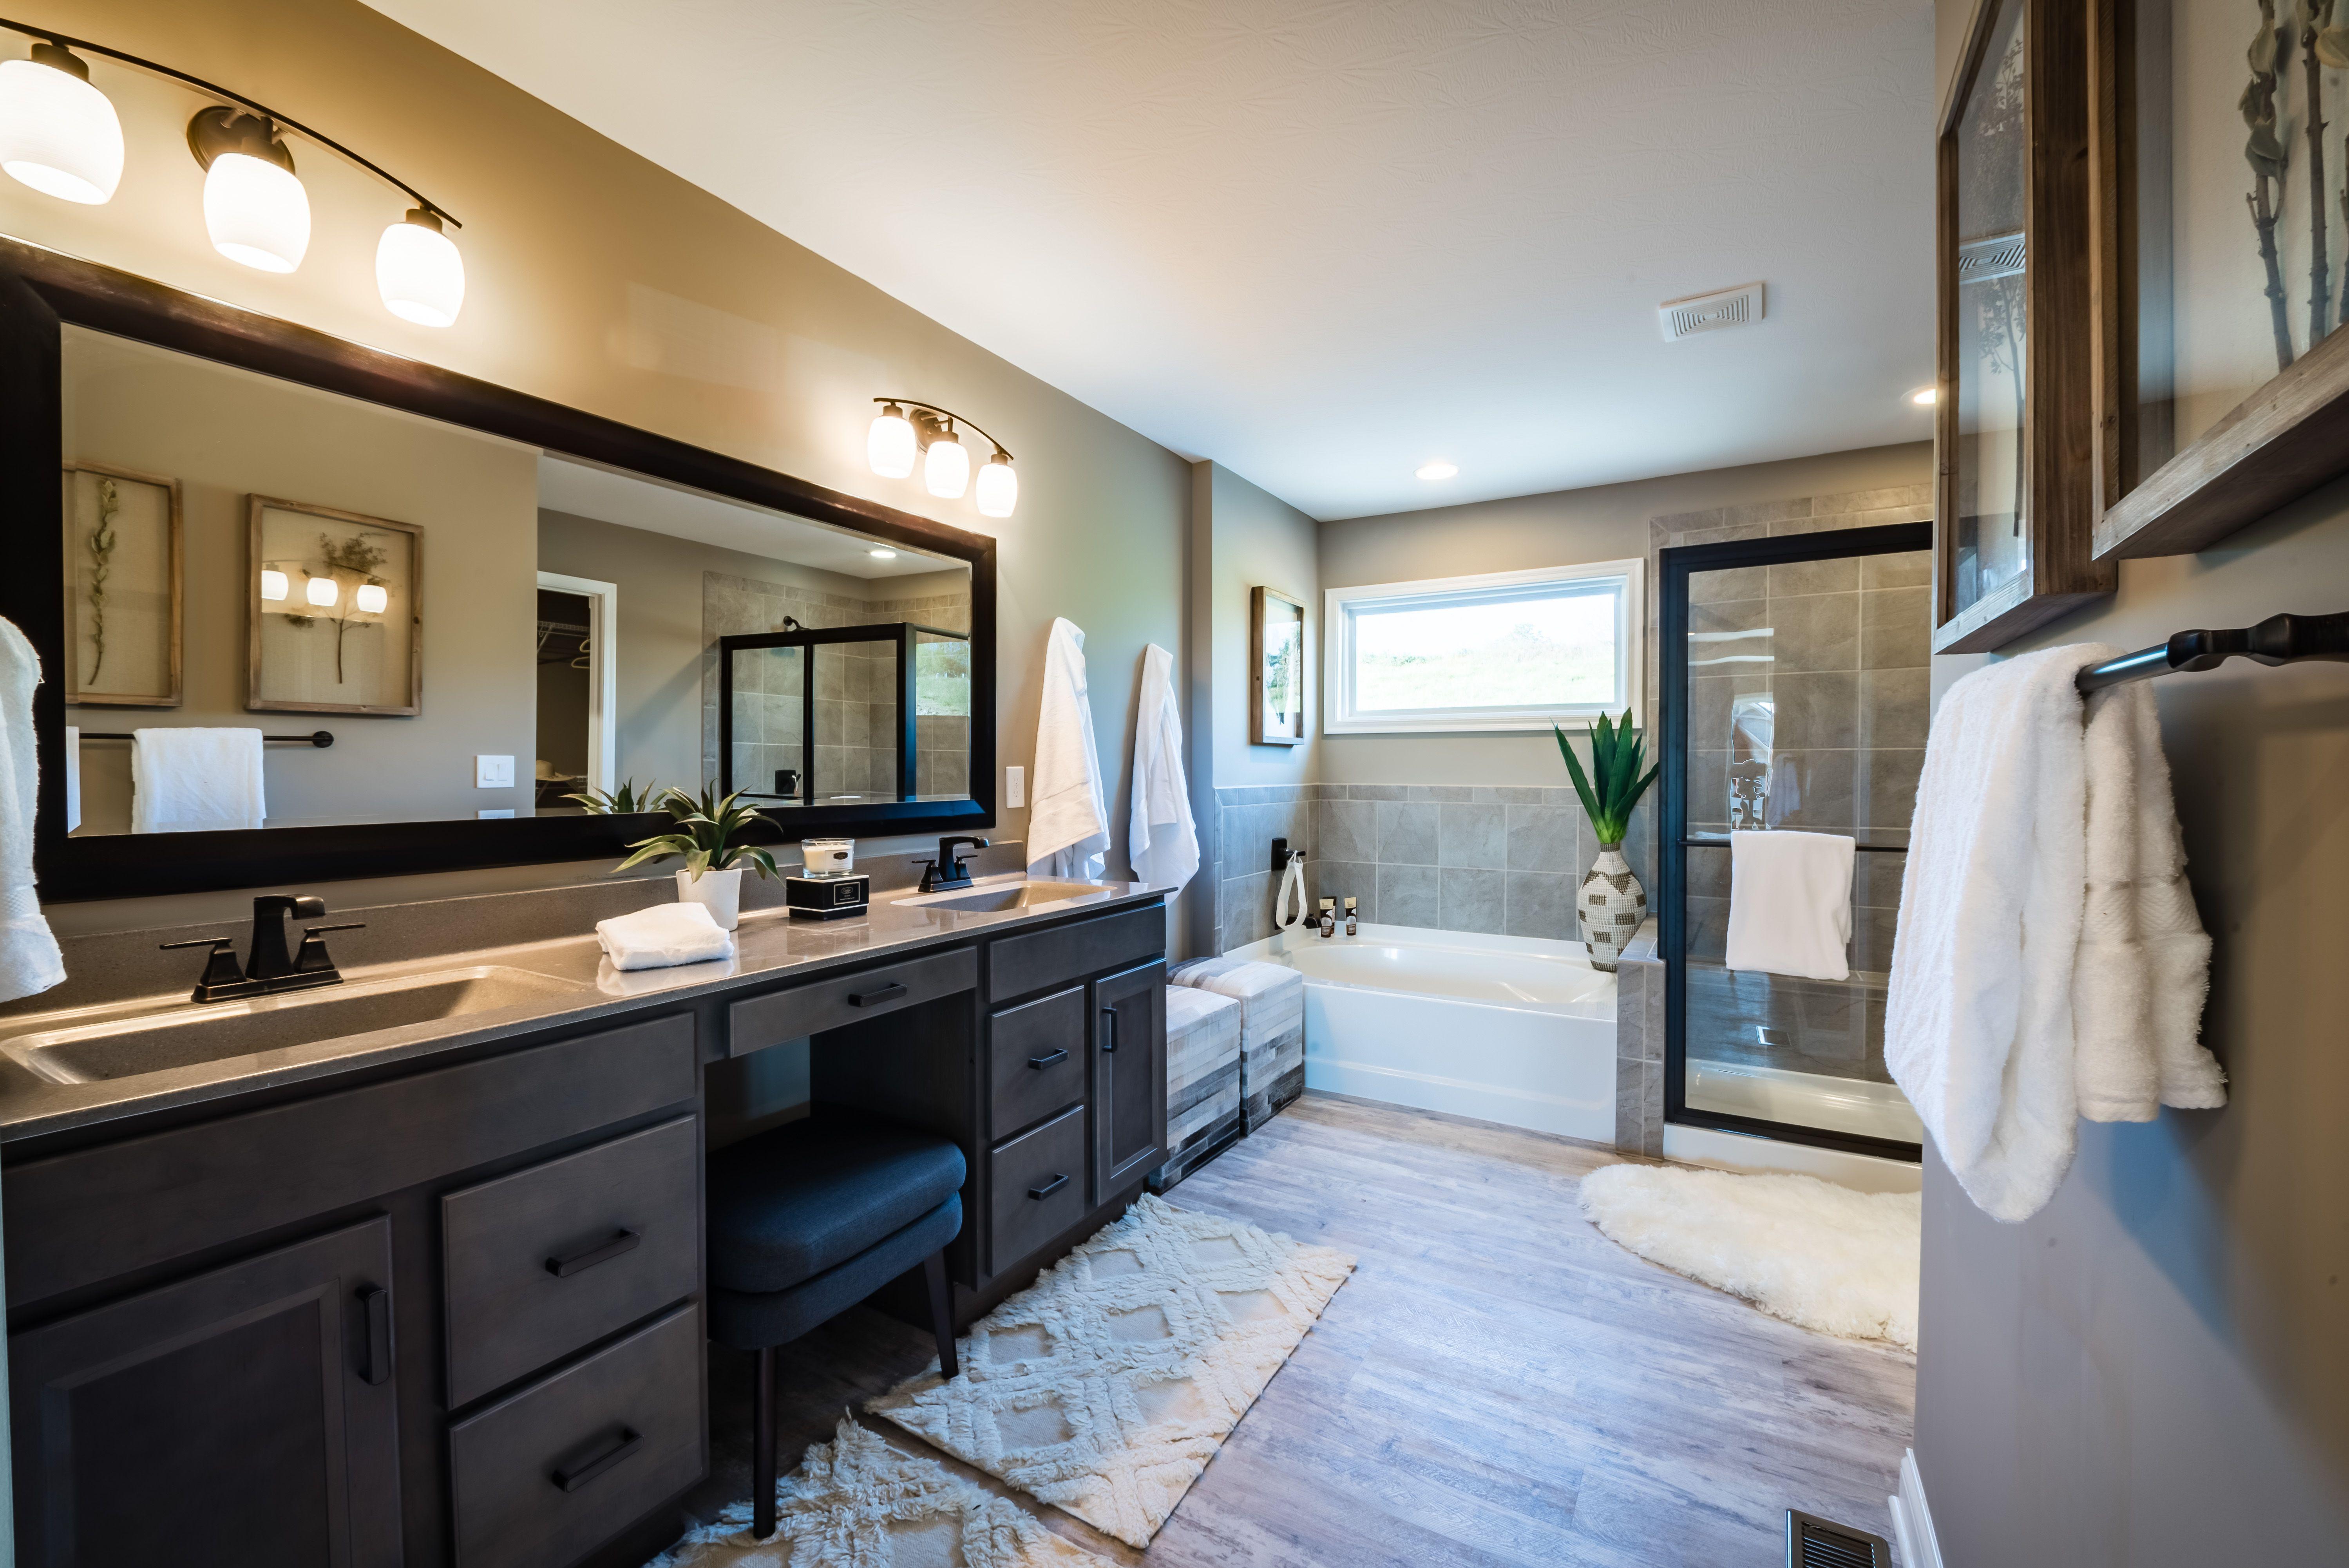 Bathroom featured in the Foster By Fischer Homes  in Cincinnati, KY